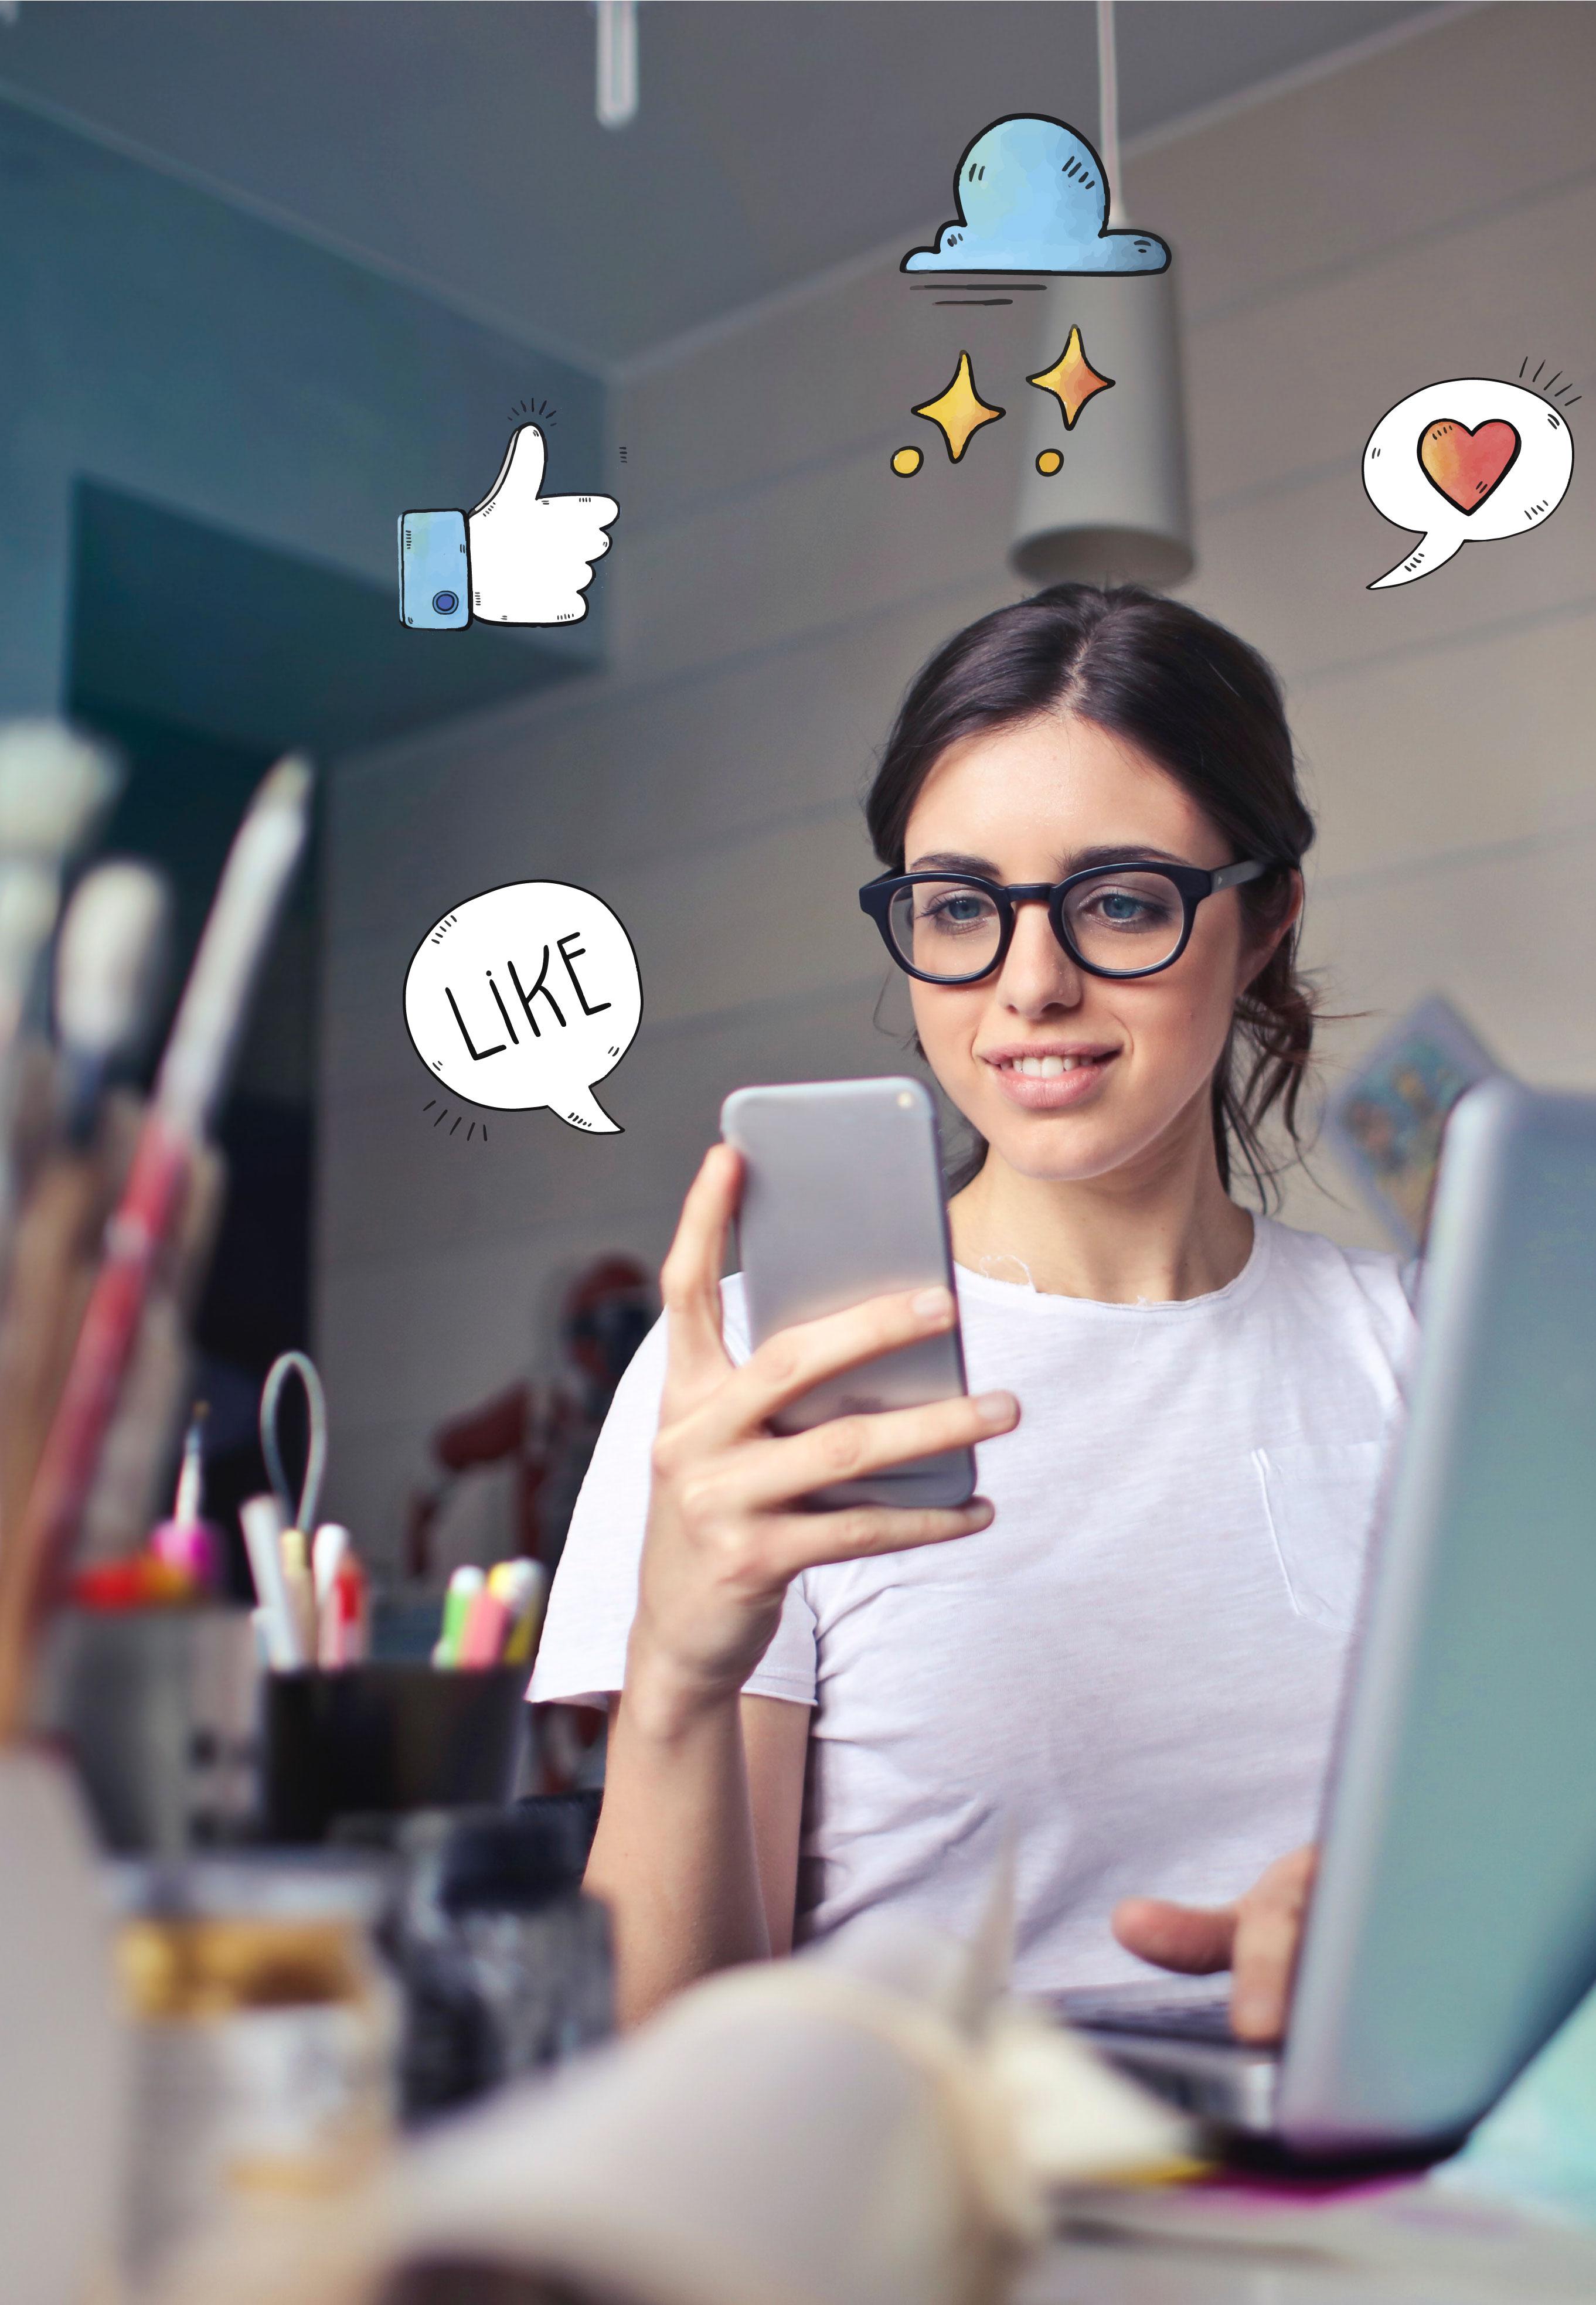 Clariter's combination of digital marketing experts, DIGITAL MARKETING